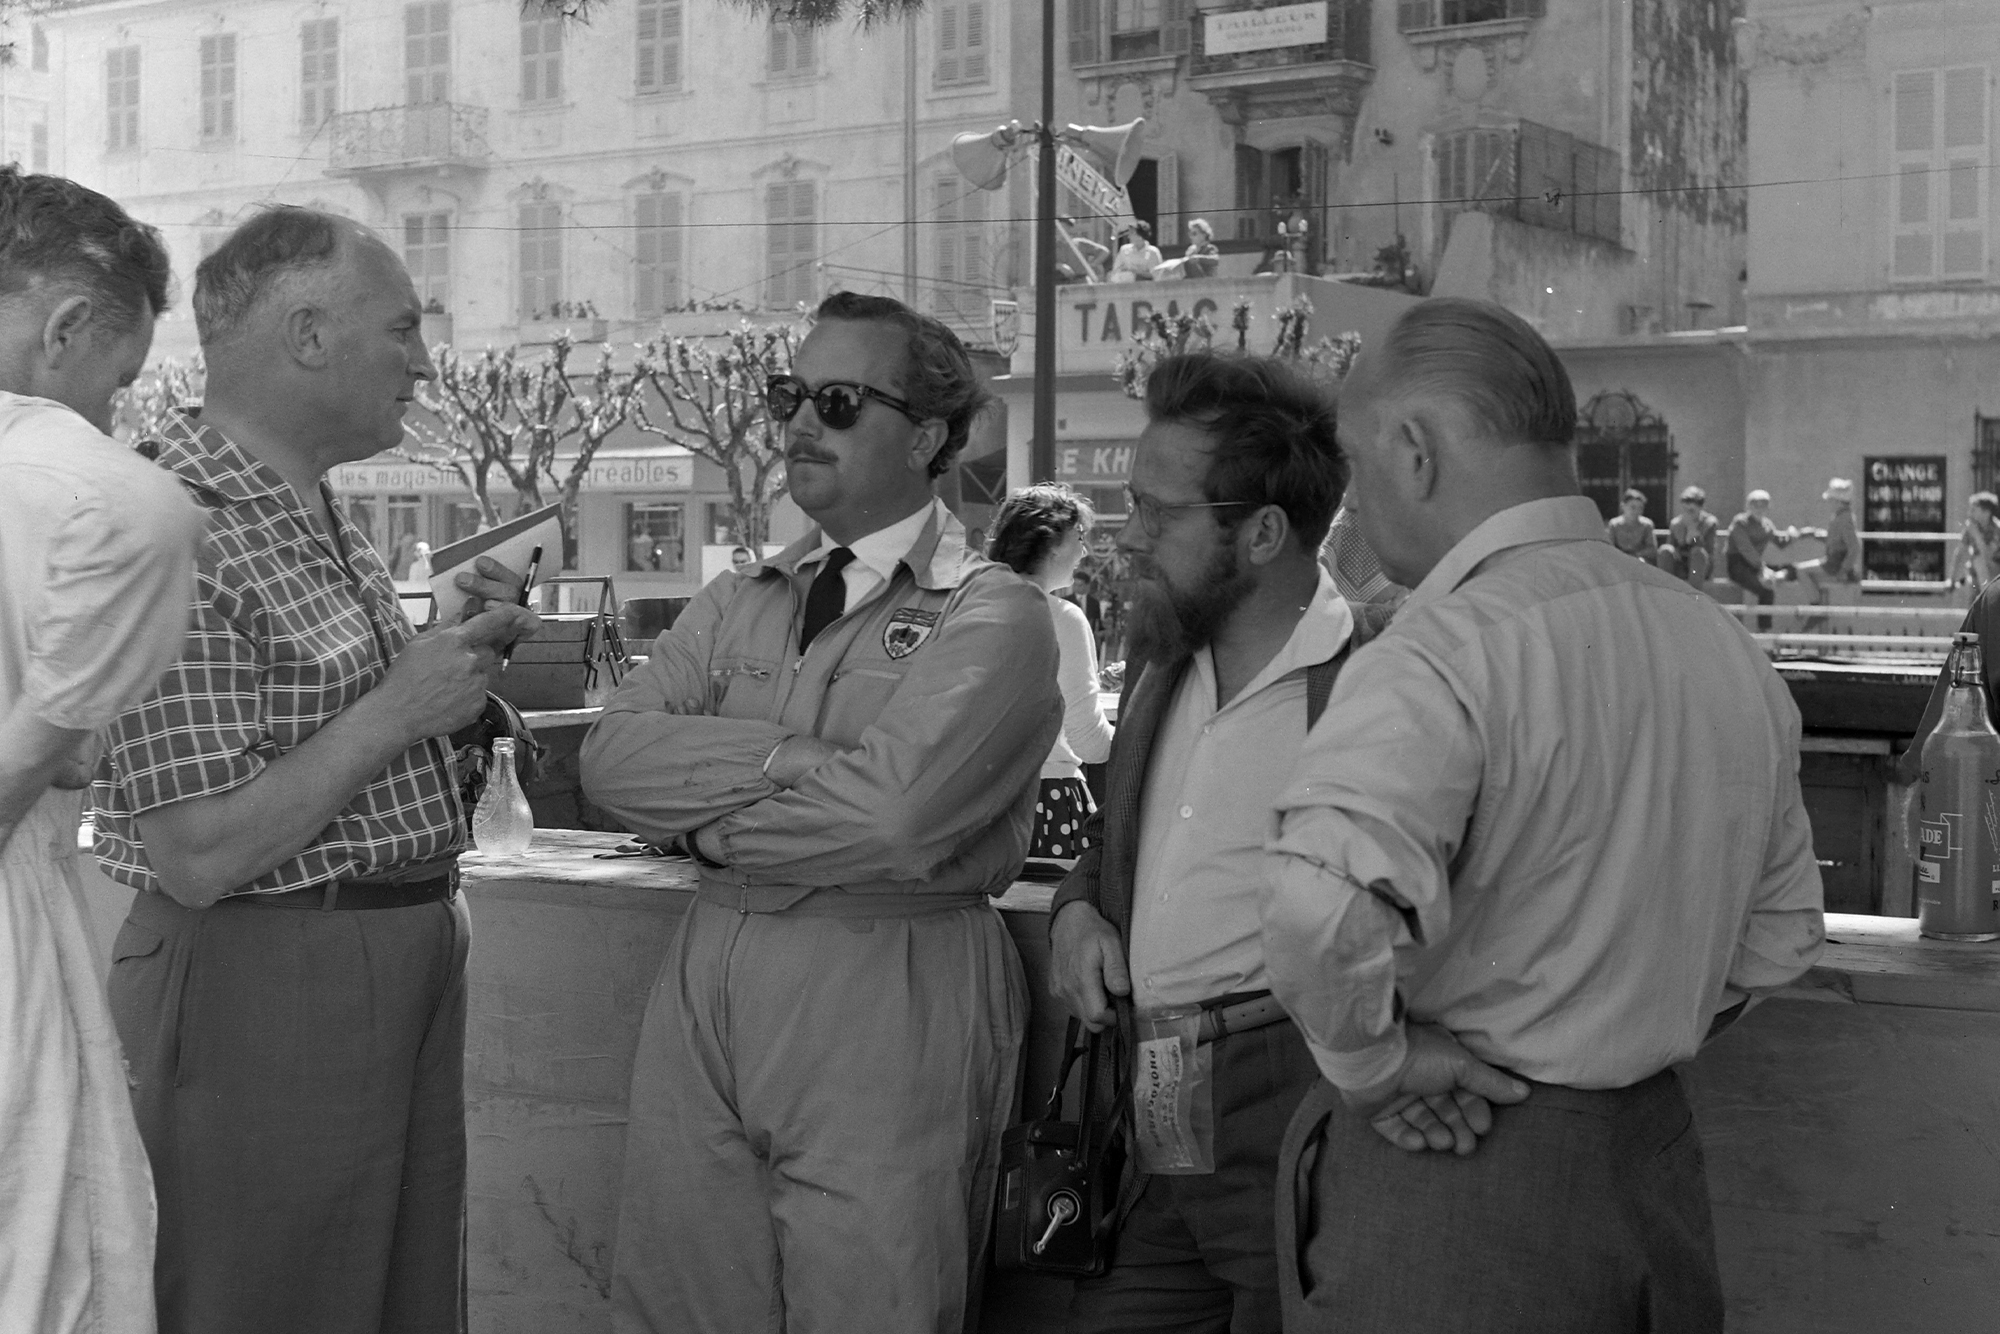 Colin Chapman talks with Denis Jenkinson at the 1958 Monaco Grand Prix